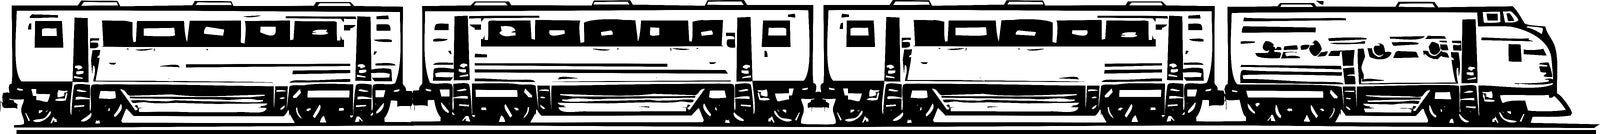 Diesel Locomotive Stock Image